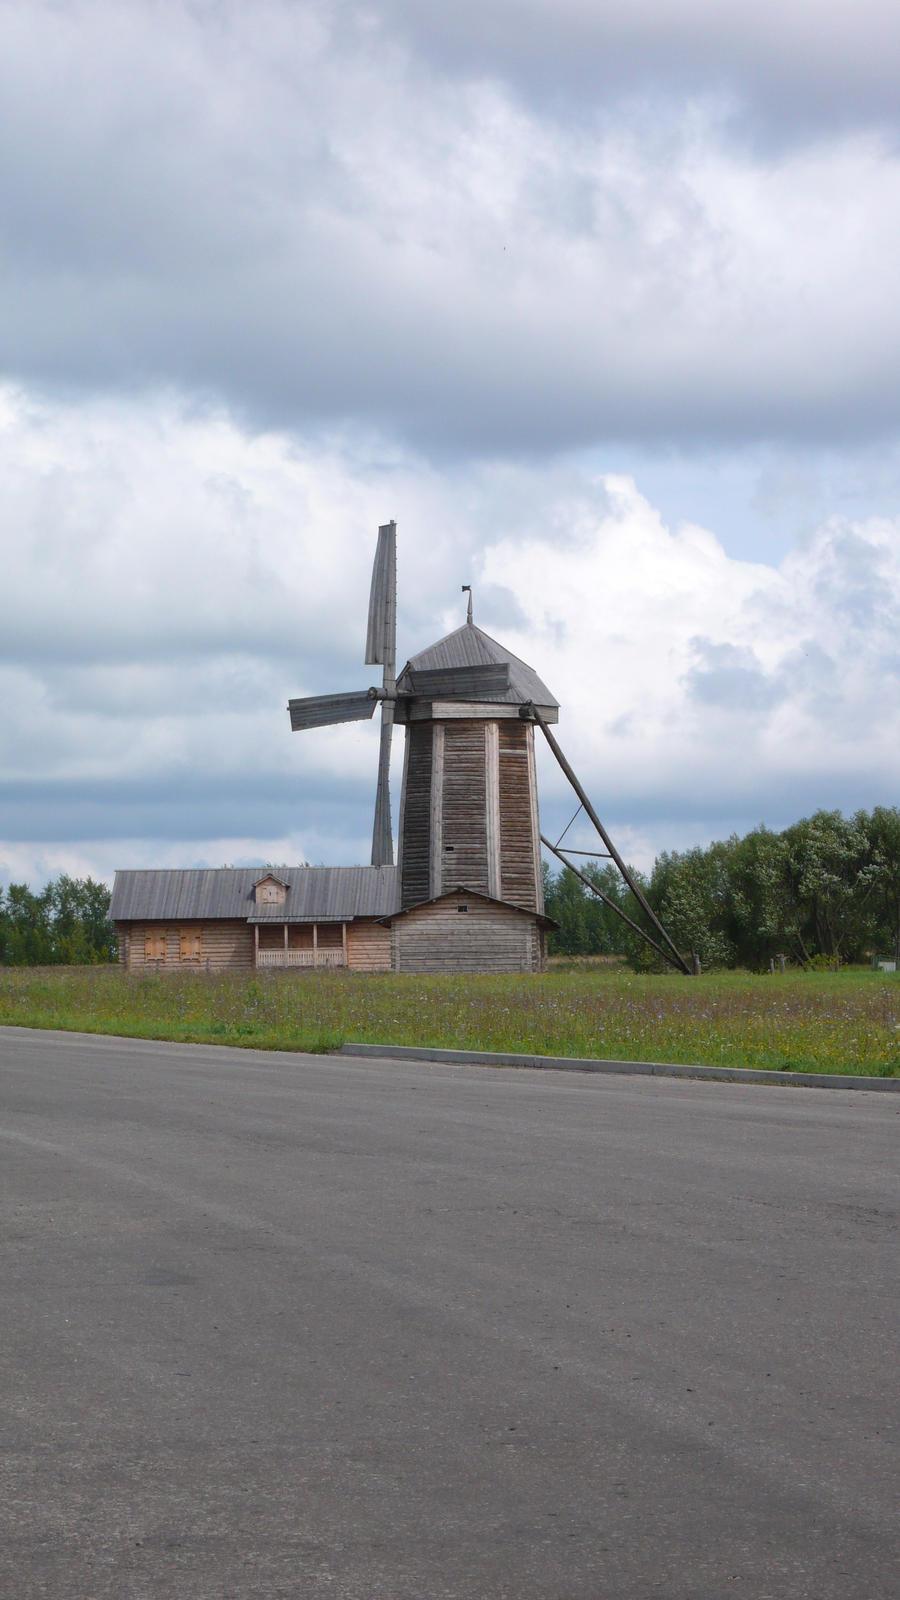 Windmill by AngelWZR